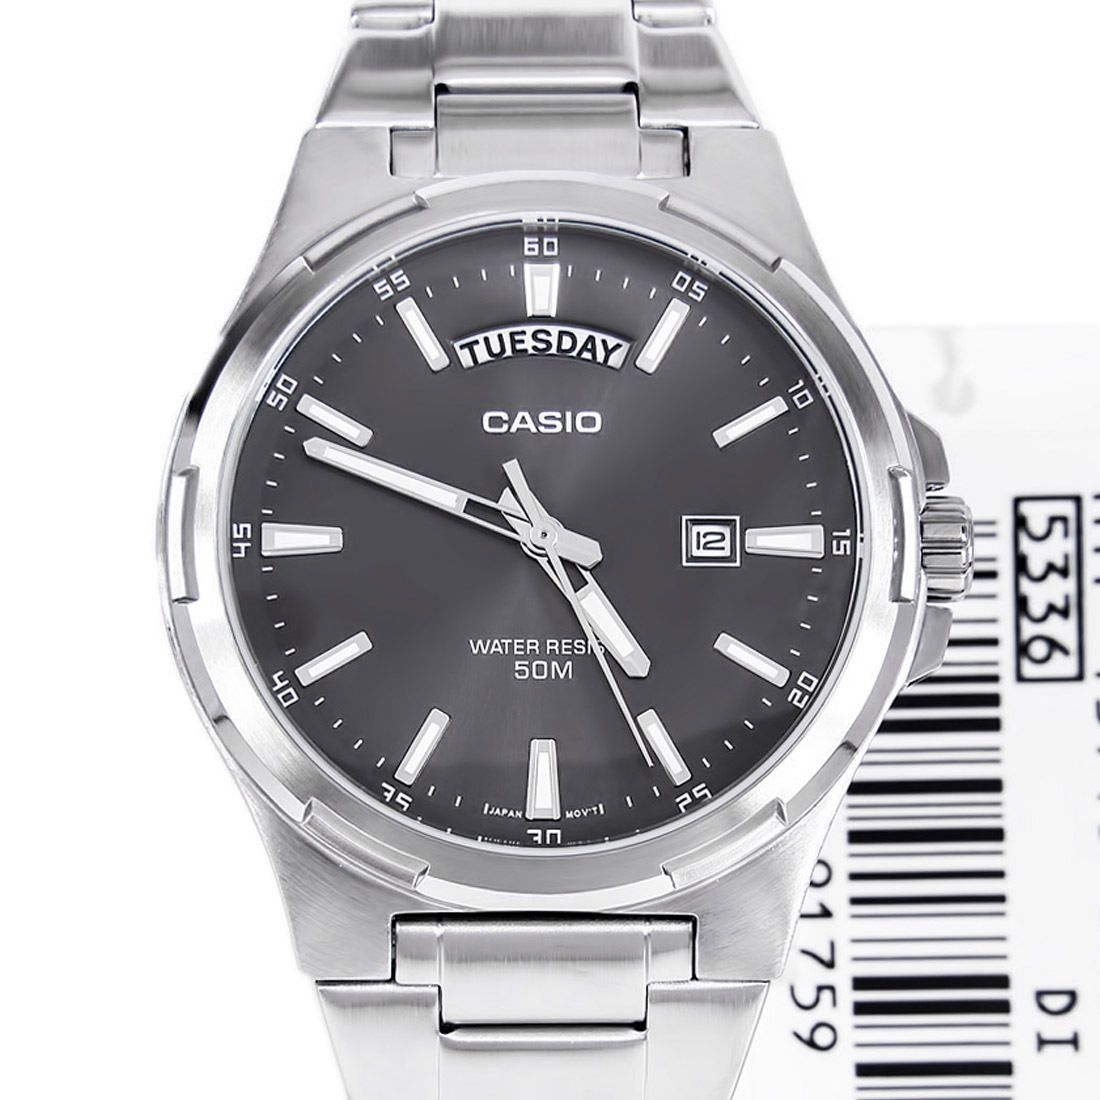 Chronograph-Divers.com - Casio Quartz MTP-1371D-8AV Mens Watch, S$58.91 (http://www.chronograph-divers.com/casio-quartz-mtp-1371d-8av-mens-watch/)